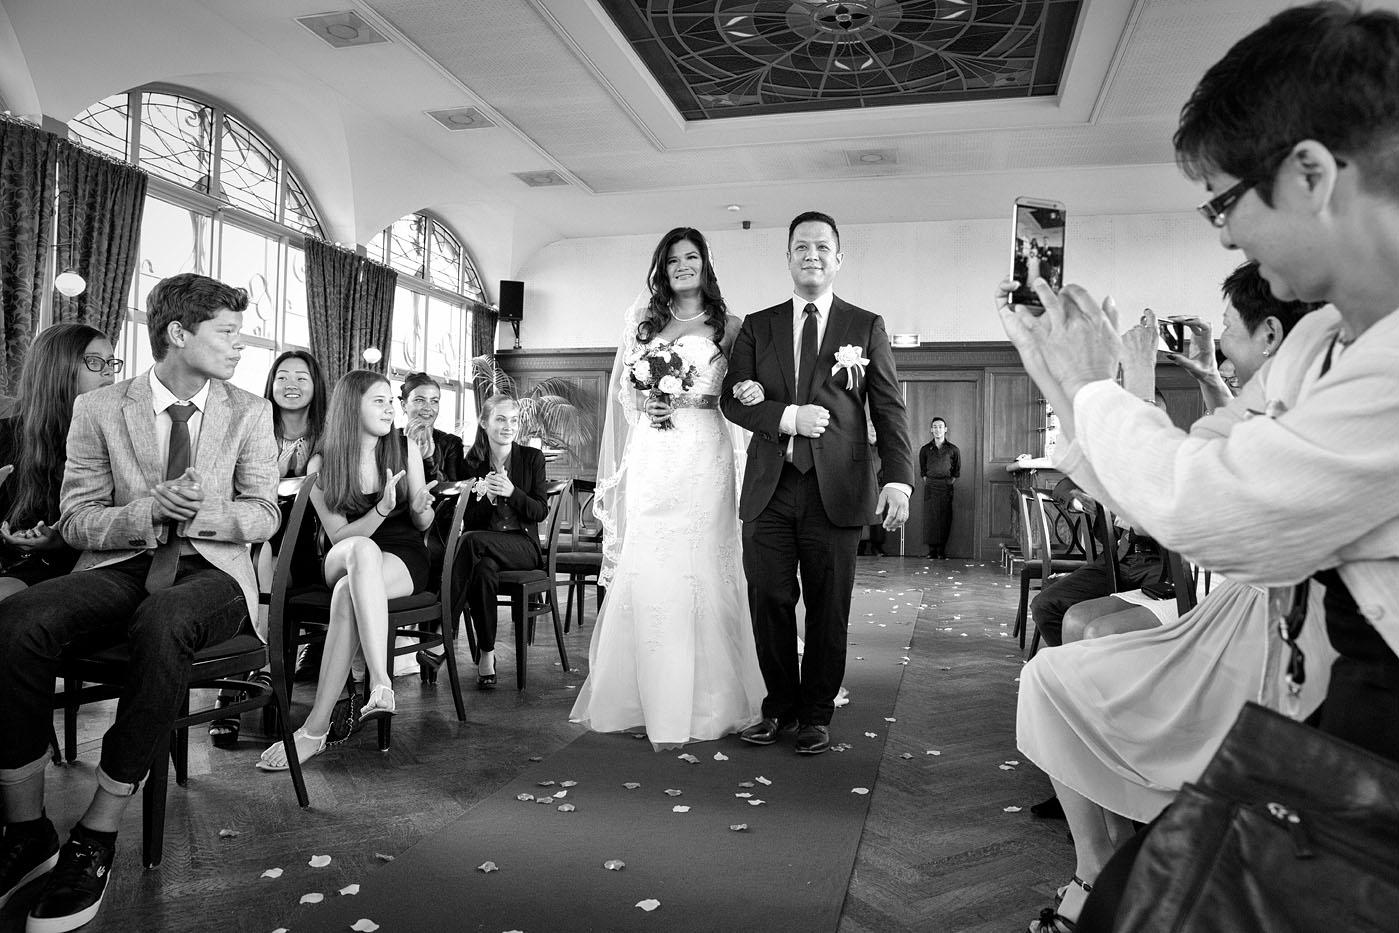 bruiloft-wedding-trouwen-fotograaf-chinees-bobhersbach-rotterdam-bruid